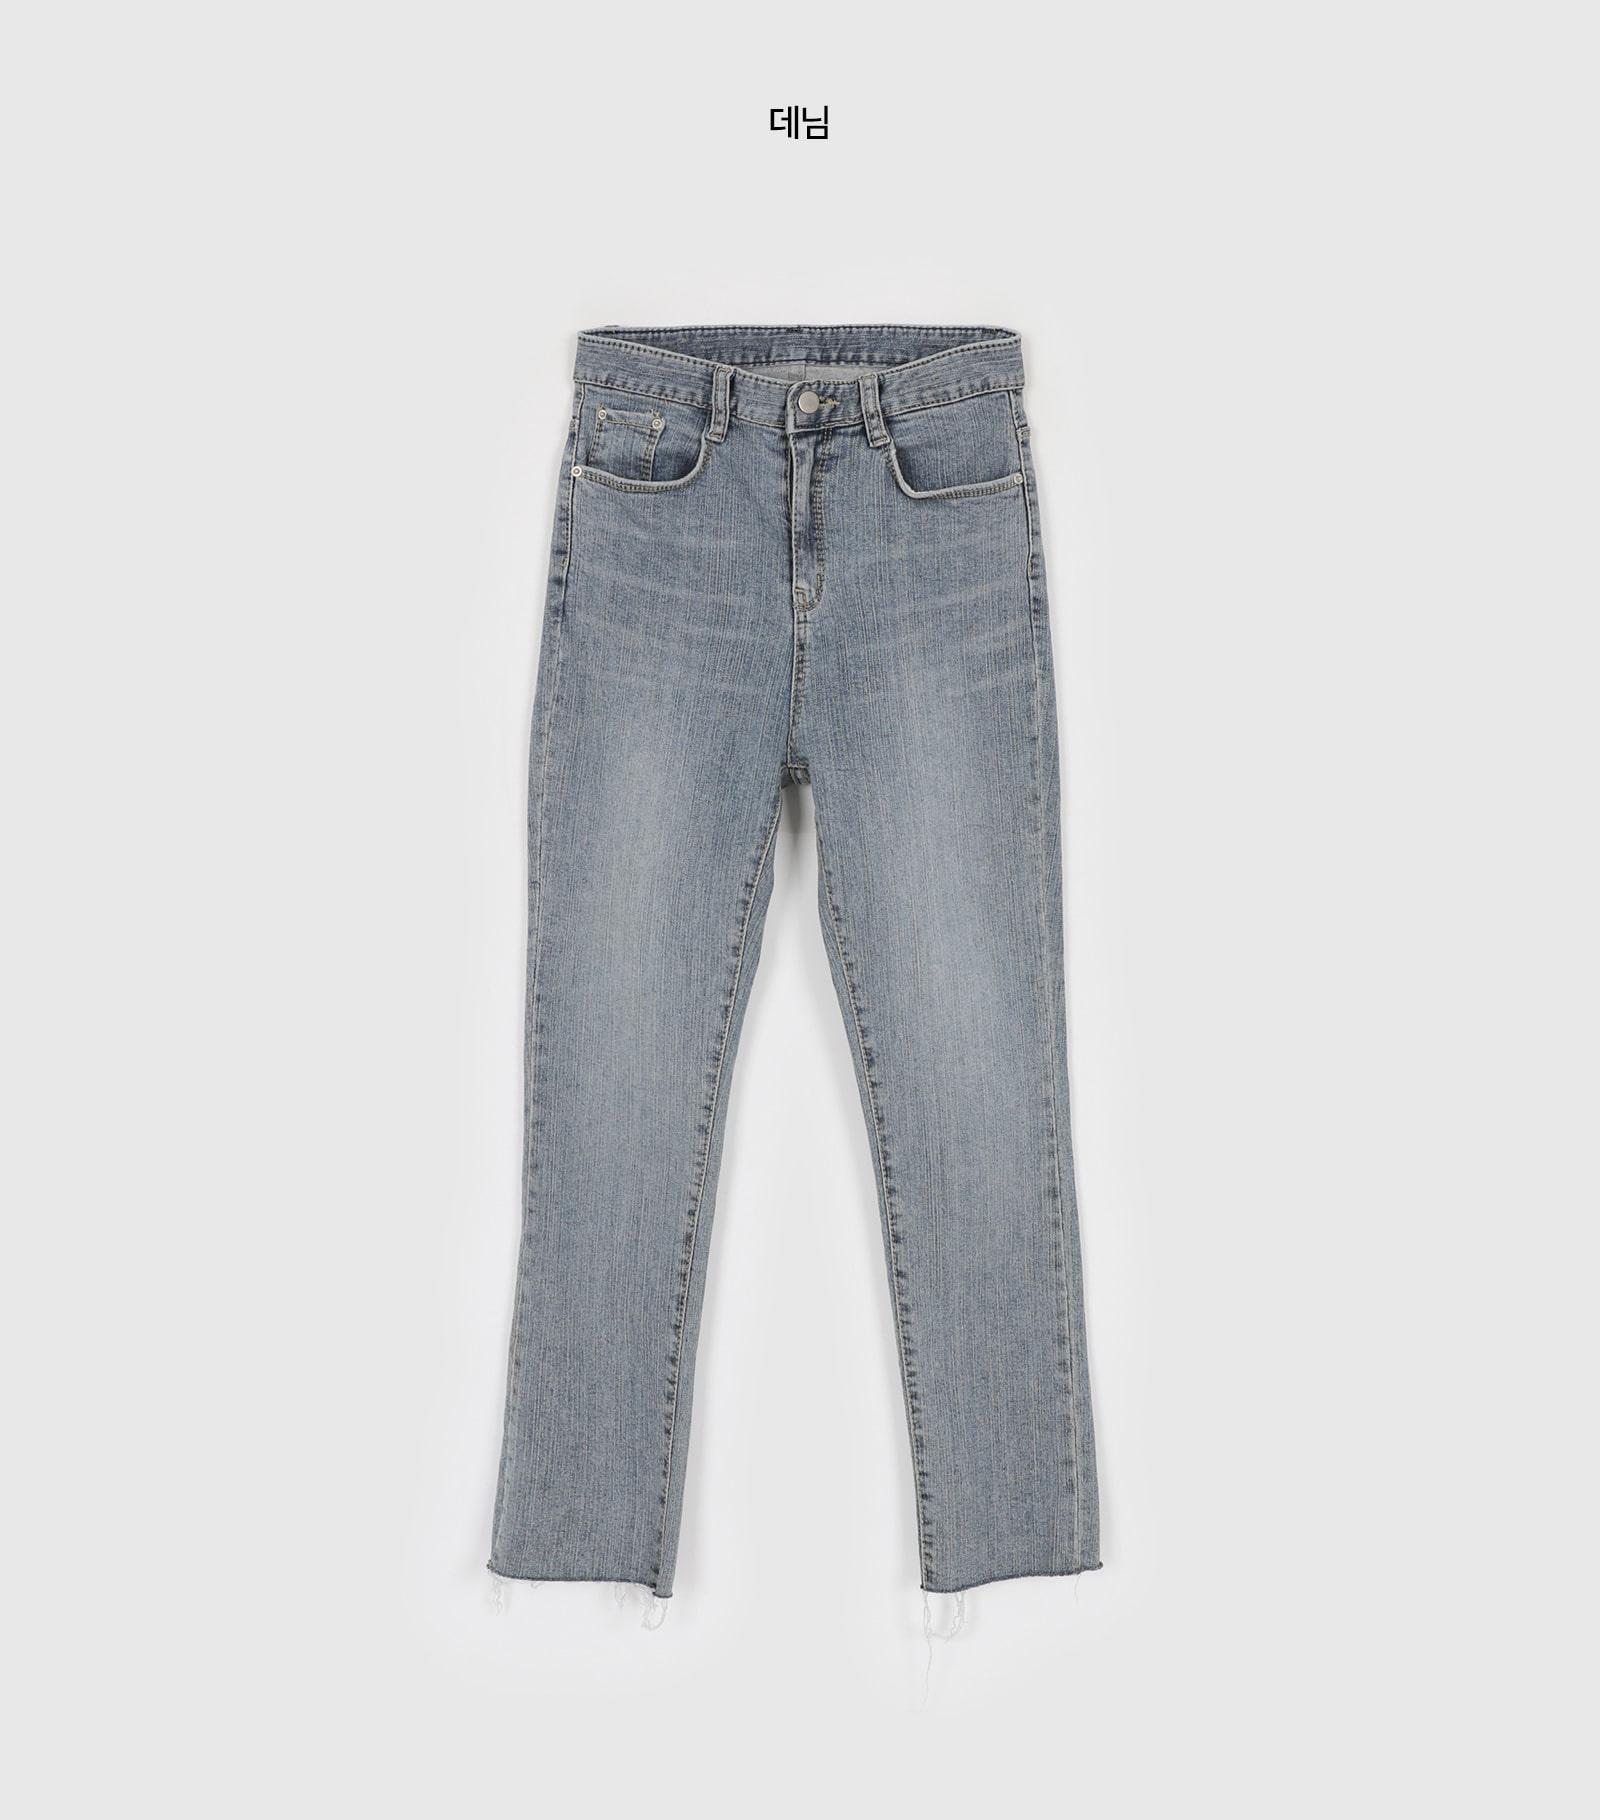 West tension skinny jeans